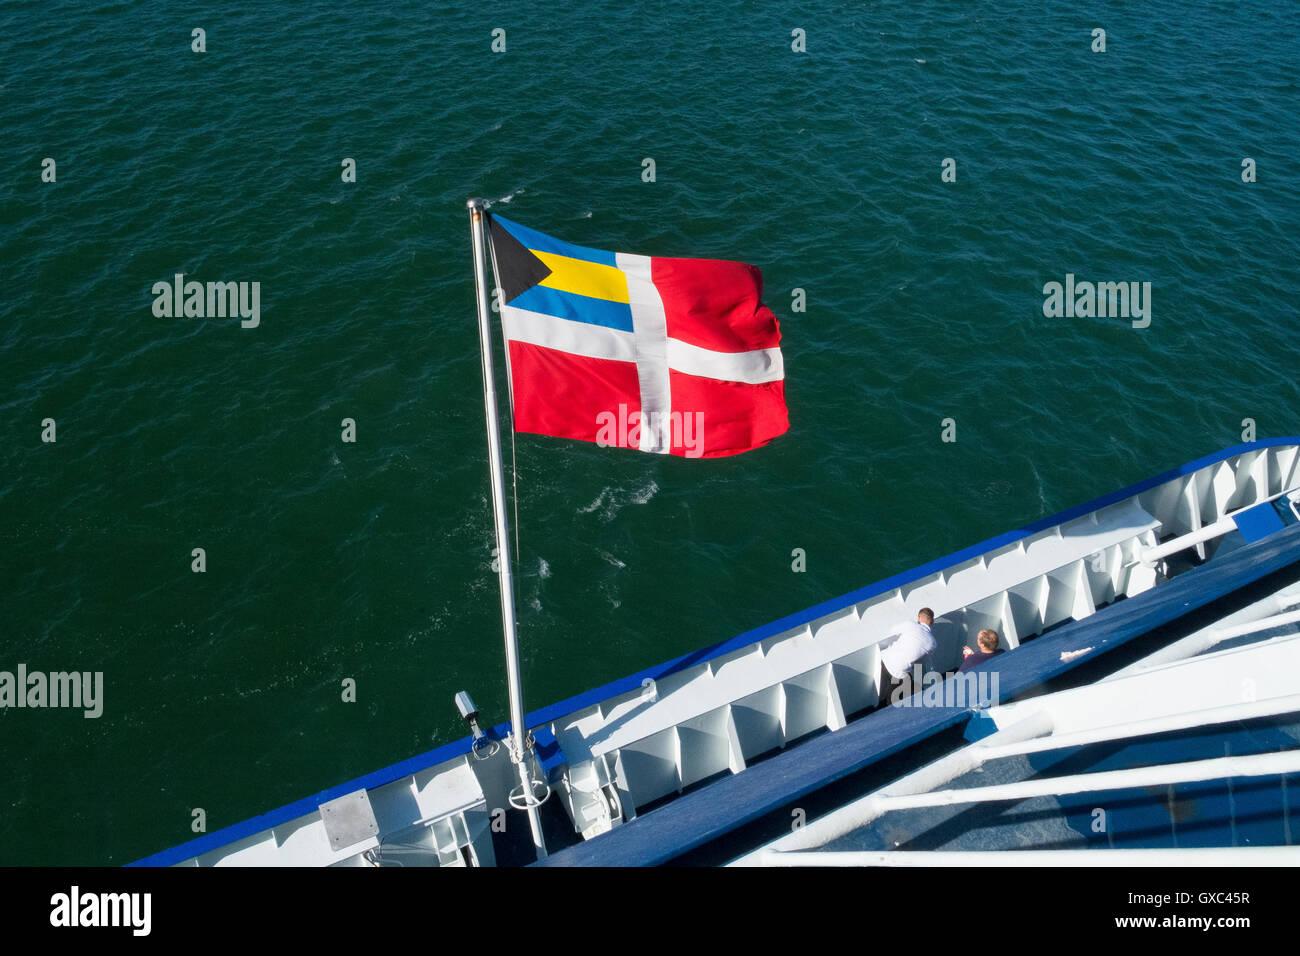 bahamian flag bahamas national emblem - Stock Image